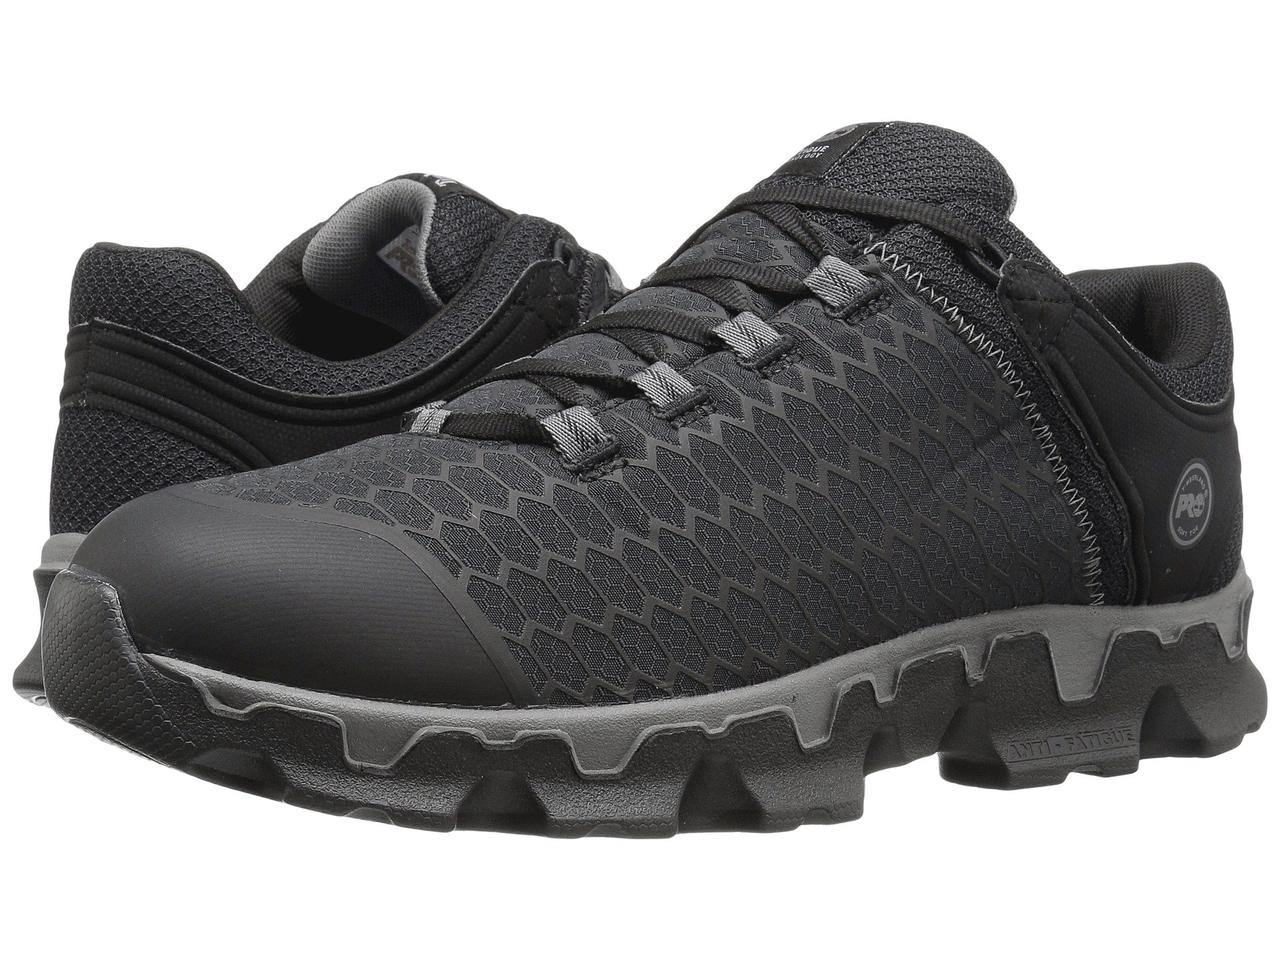 Кроссовки/Кеды (Оригинал) Timberland PRO Powertrain Soft Toe SD+ Black Synthetic